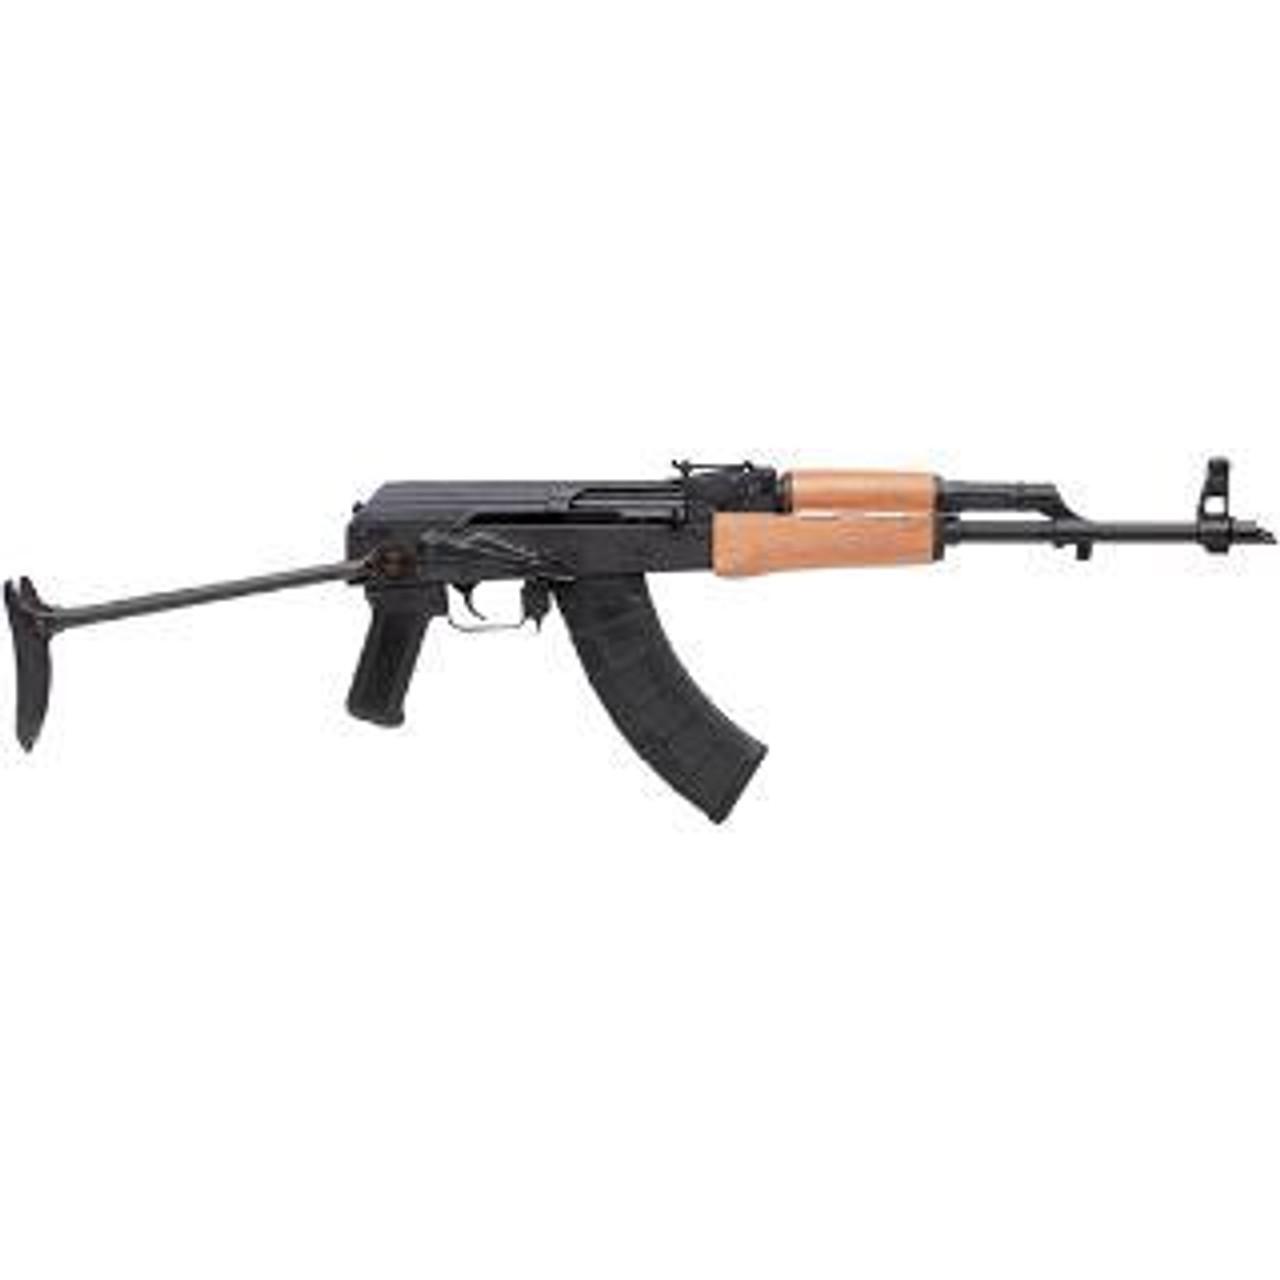 Century Arms GP WASR-10 Underfolder CALIFORNIA LEGAL - 7.62x39